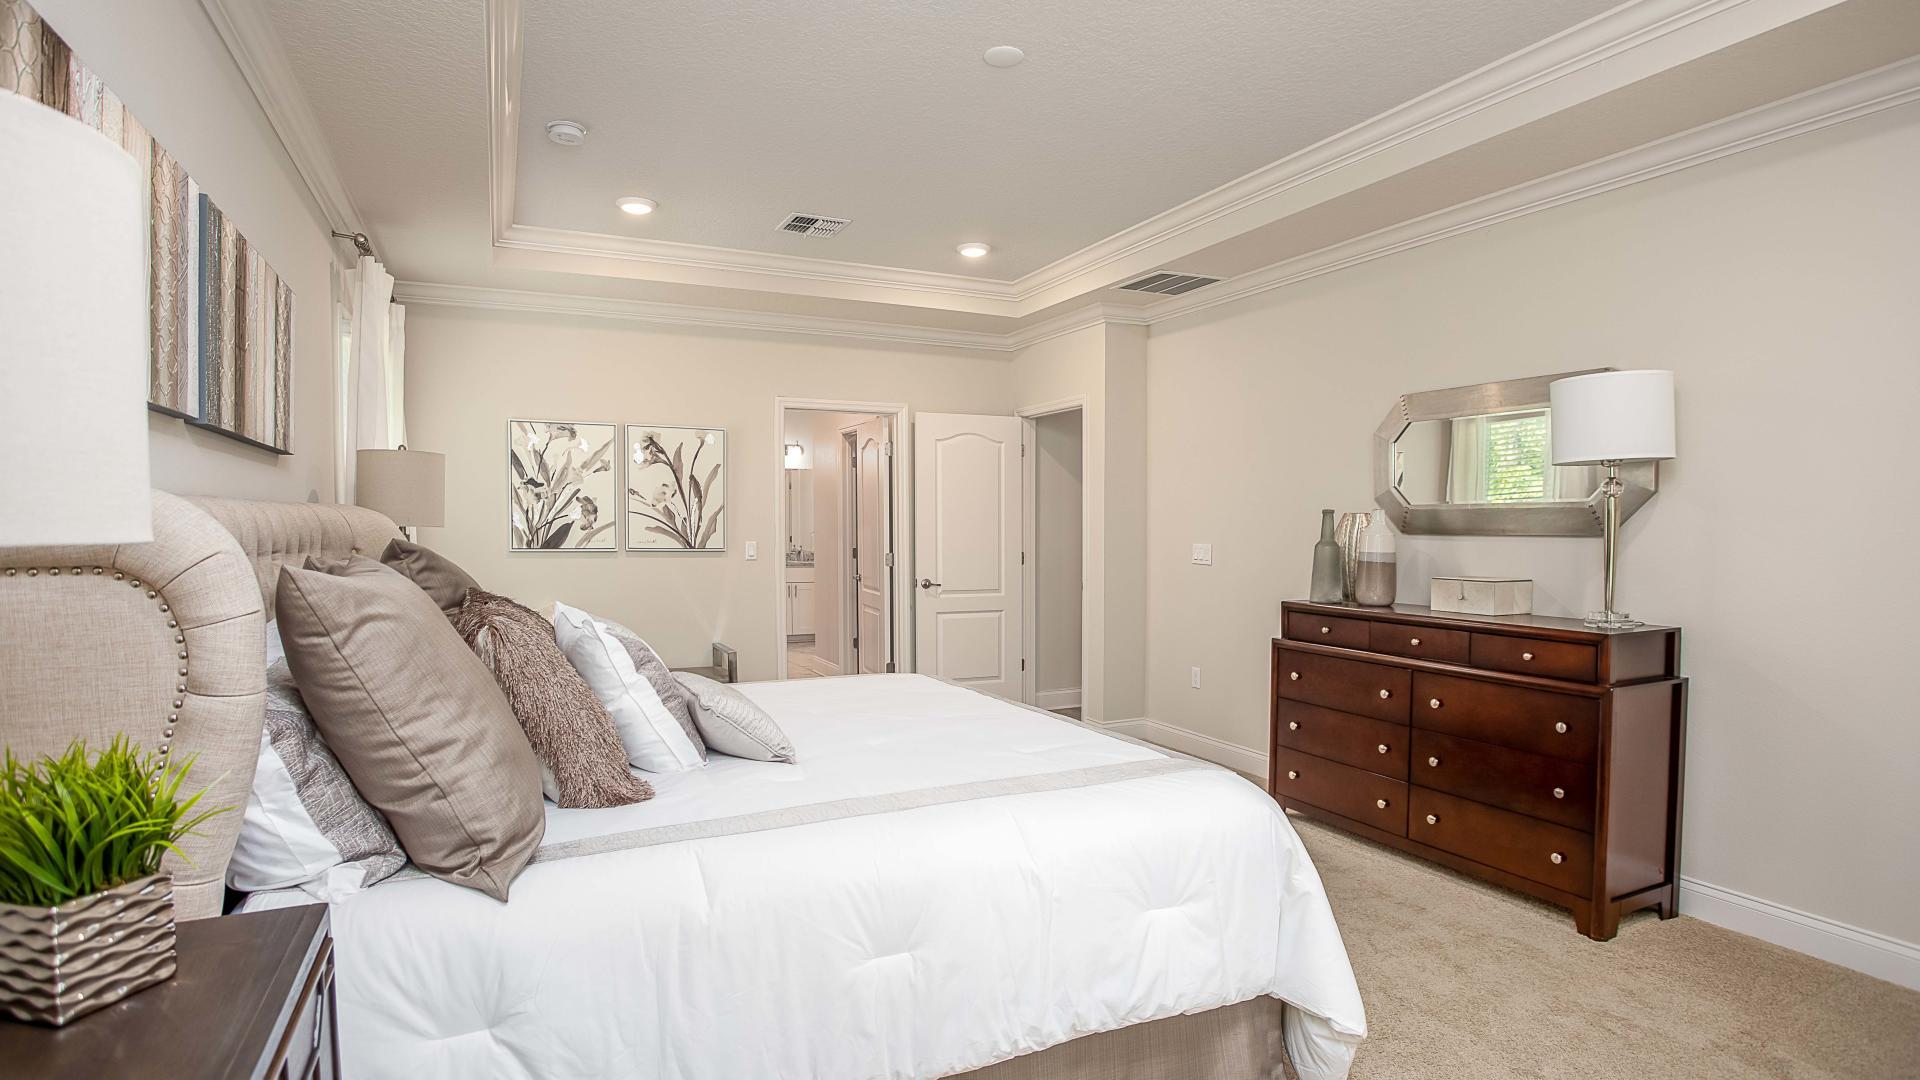 Bedroom featured in the Livorno By Maronda Homes in Ocala, FL